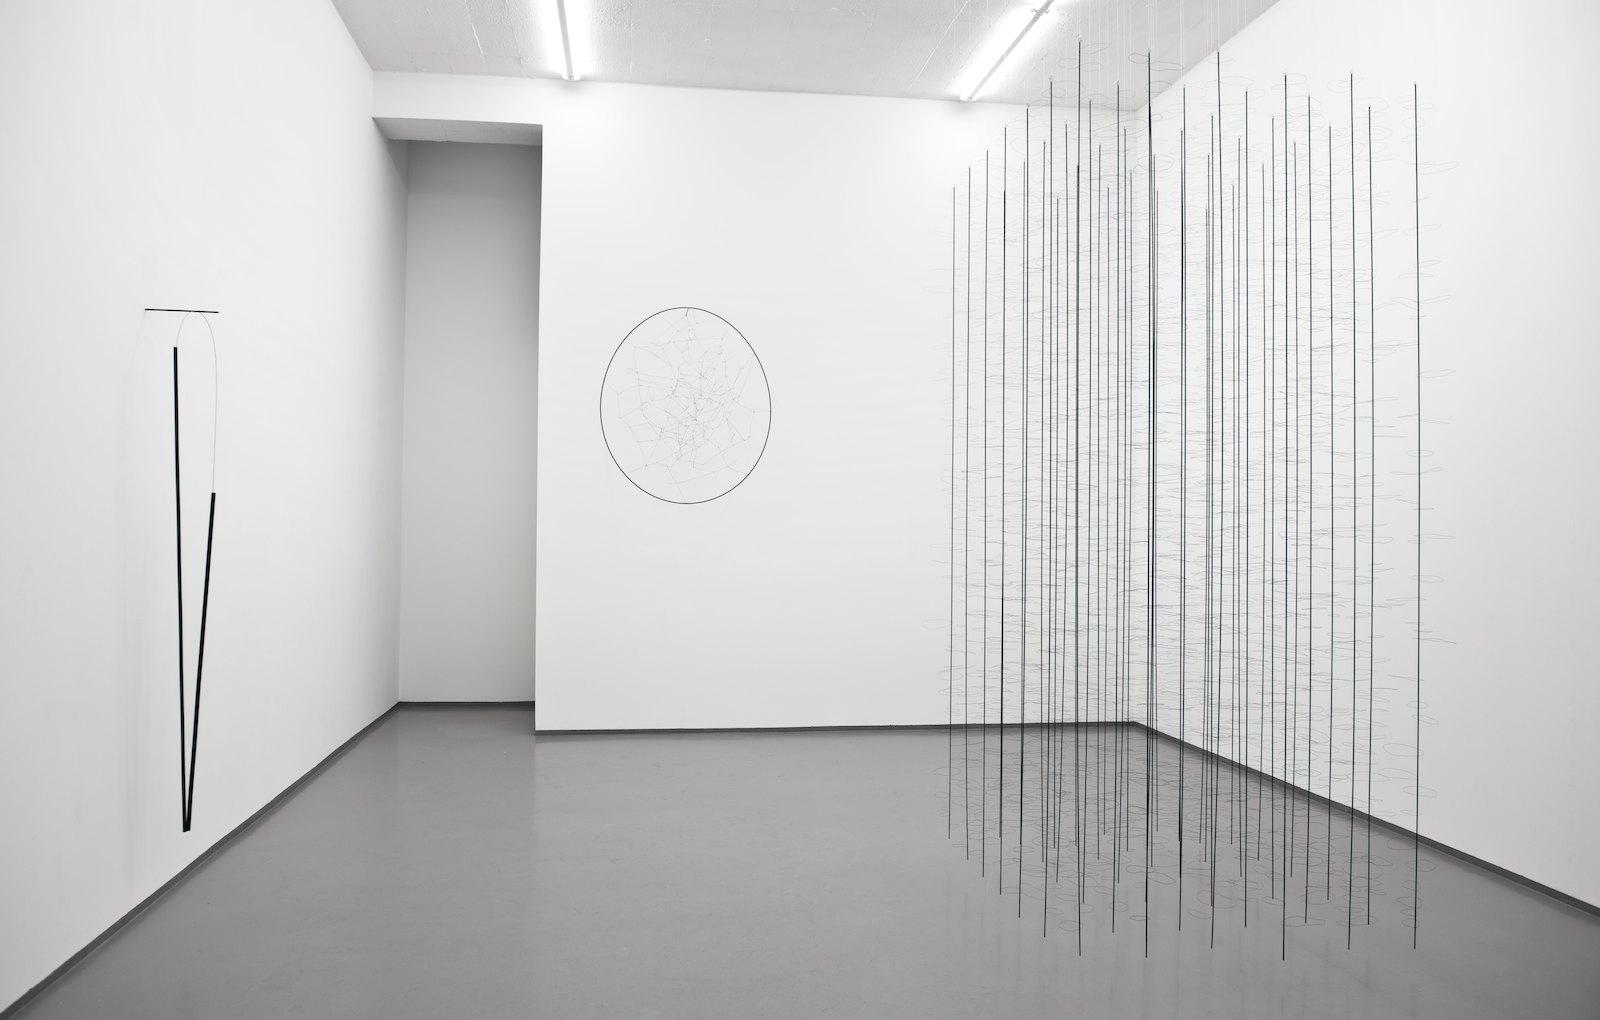 Installation view, Tone Vigeland, New Works, Galleri Riis, Oslo, 2011